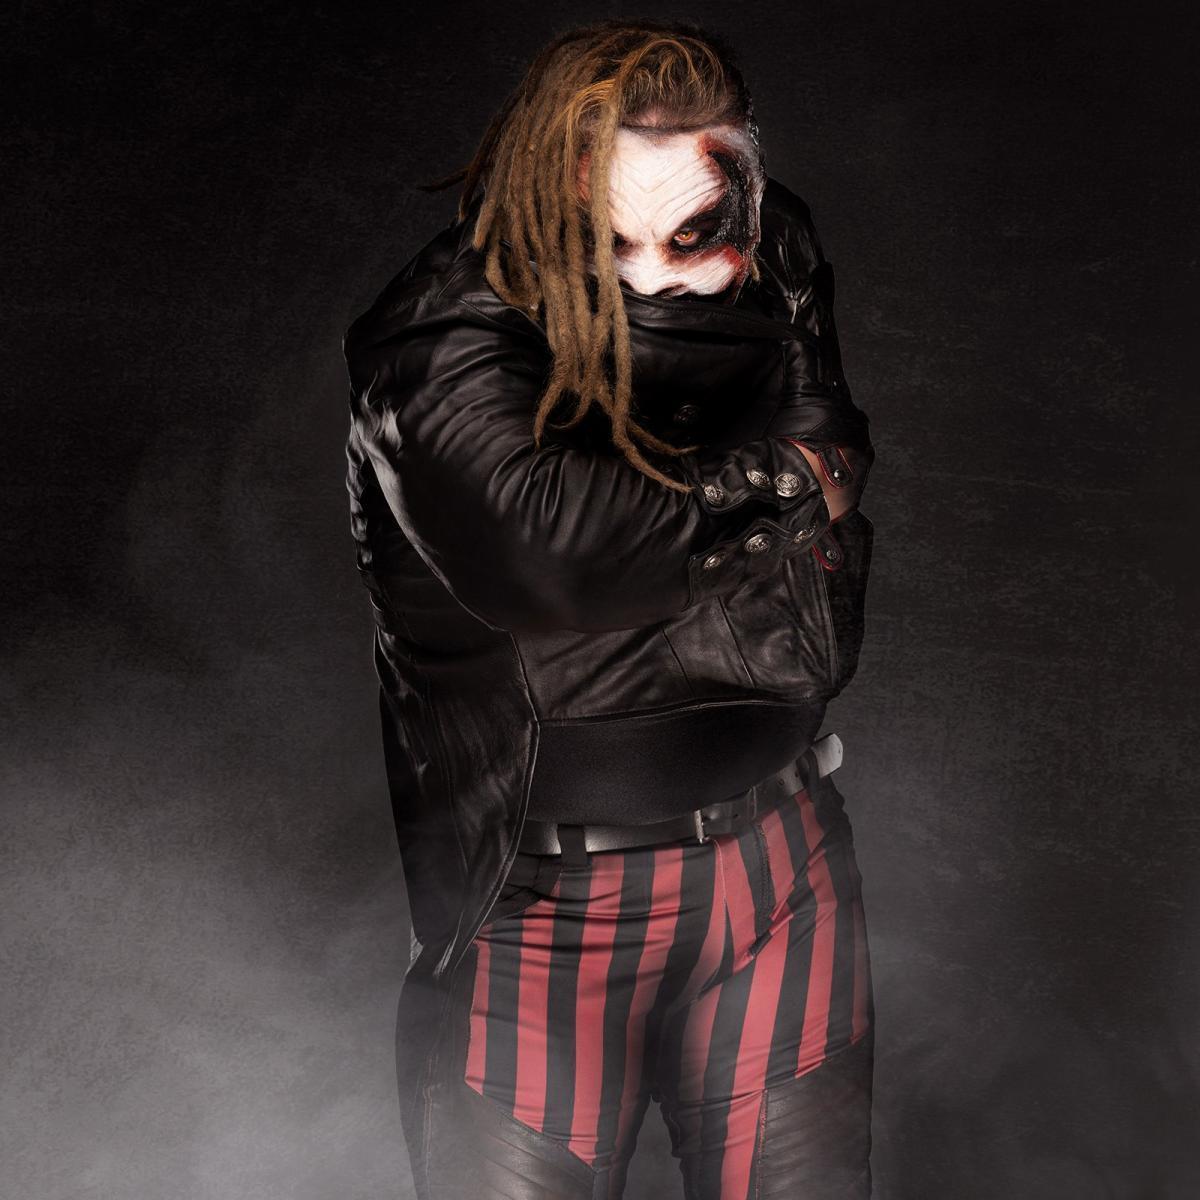 Fiend Bray Wyatt Wallpapers - Wallpaper Cave